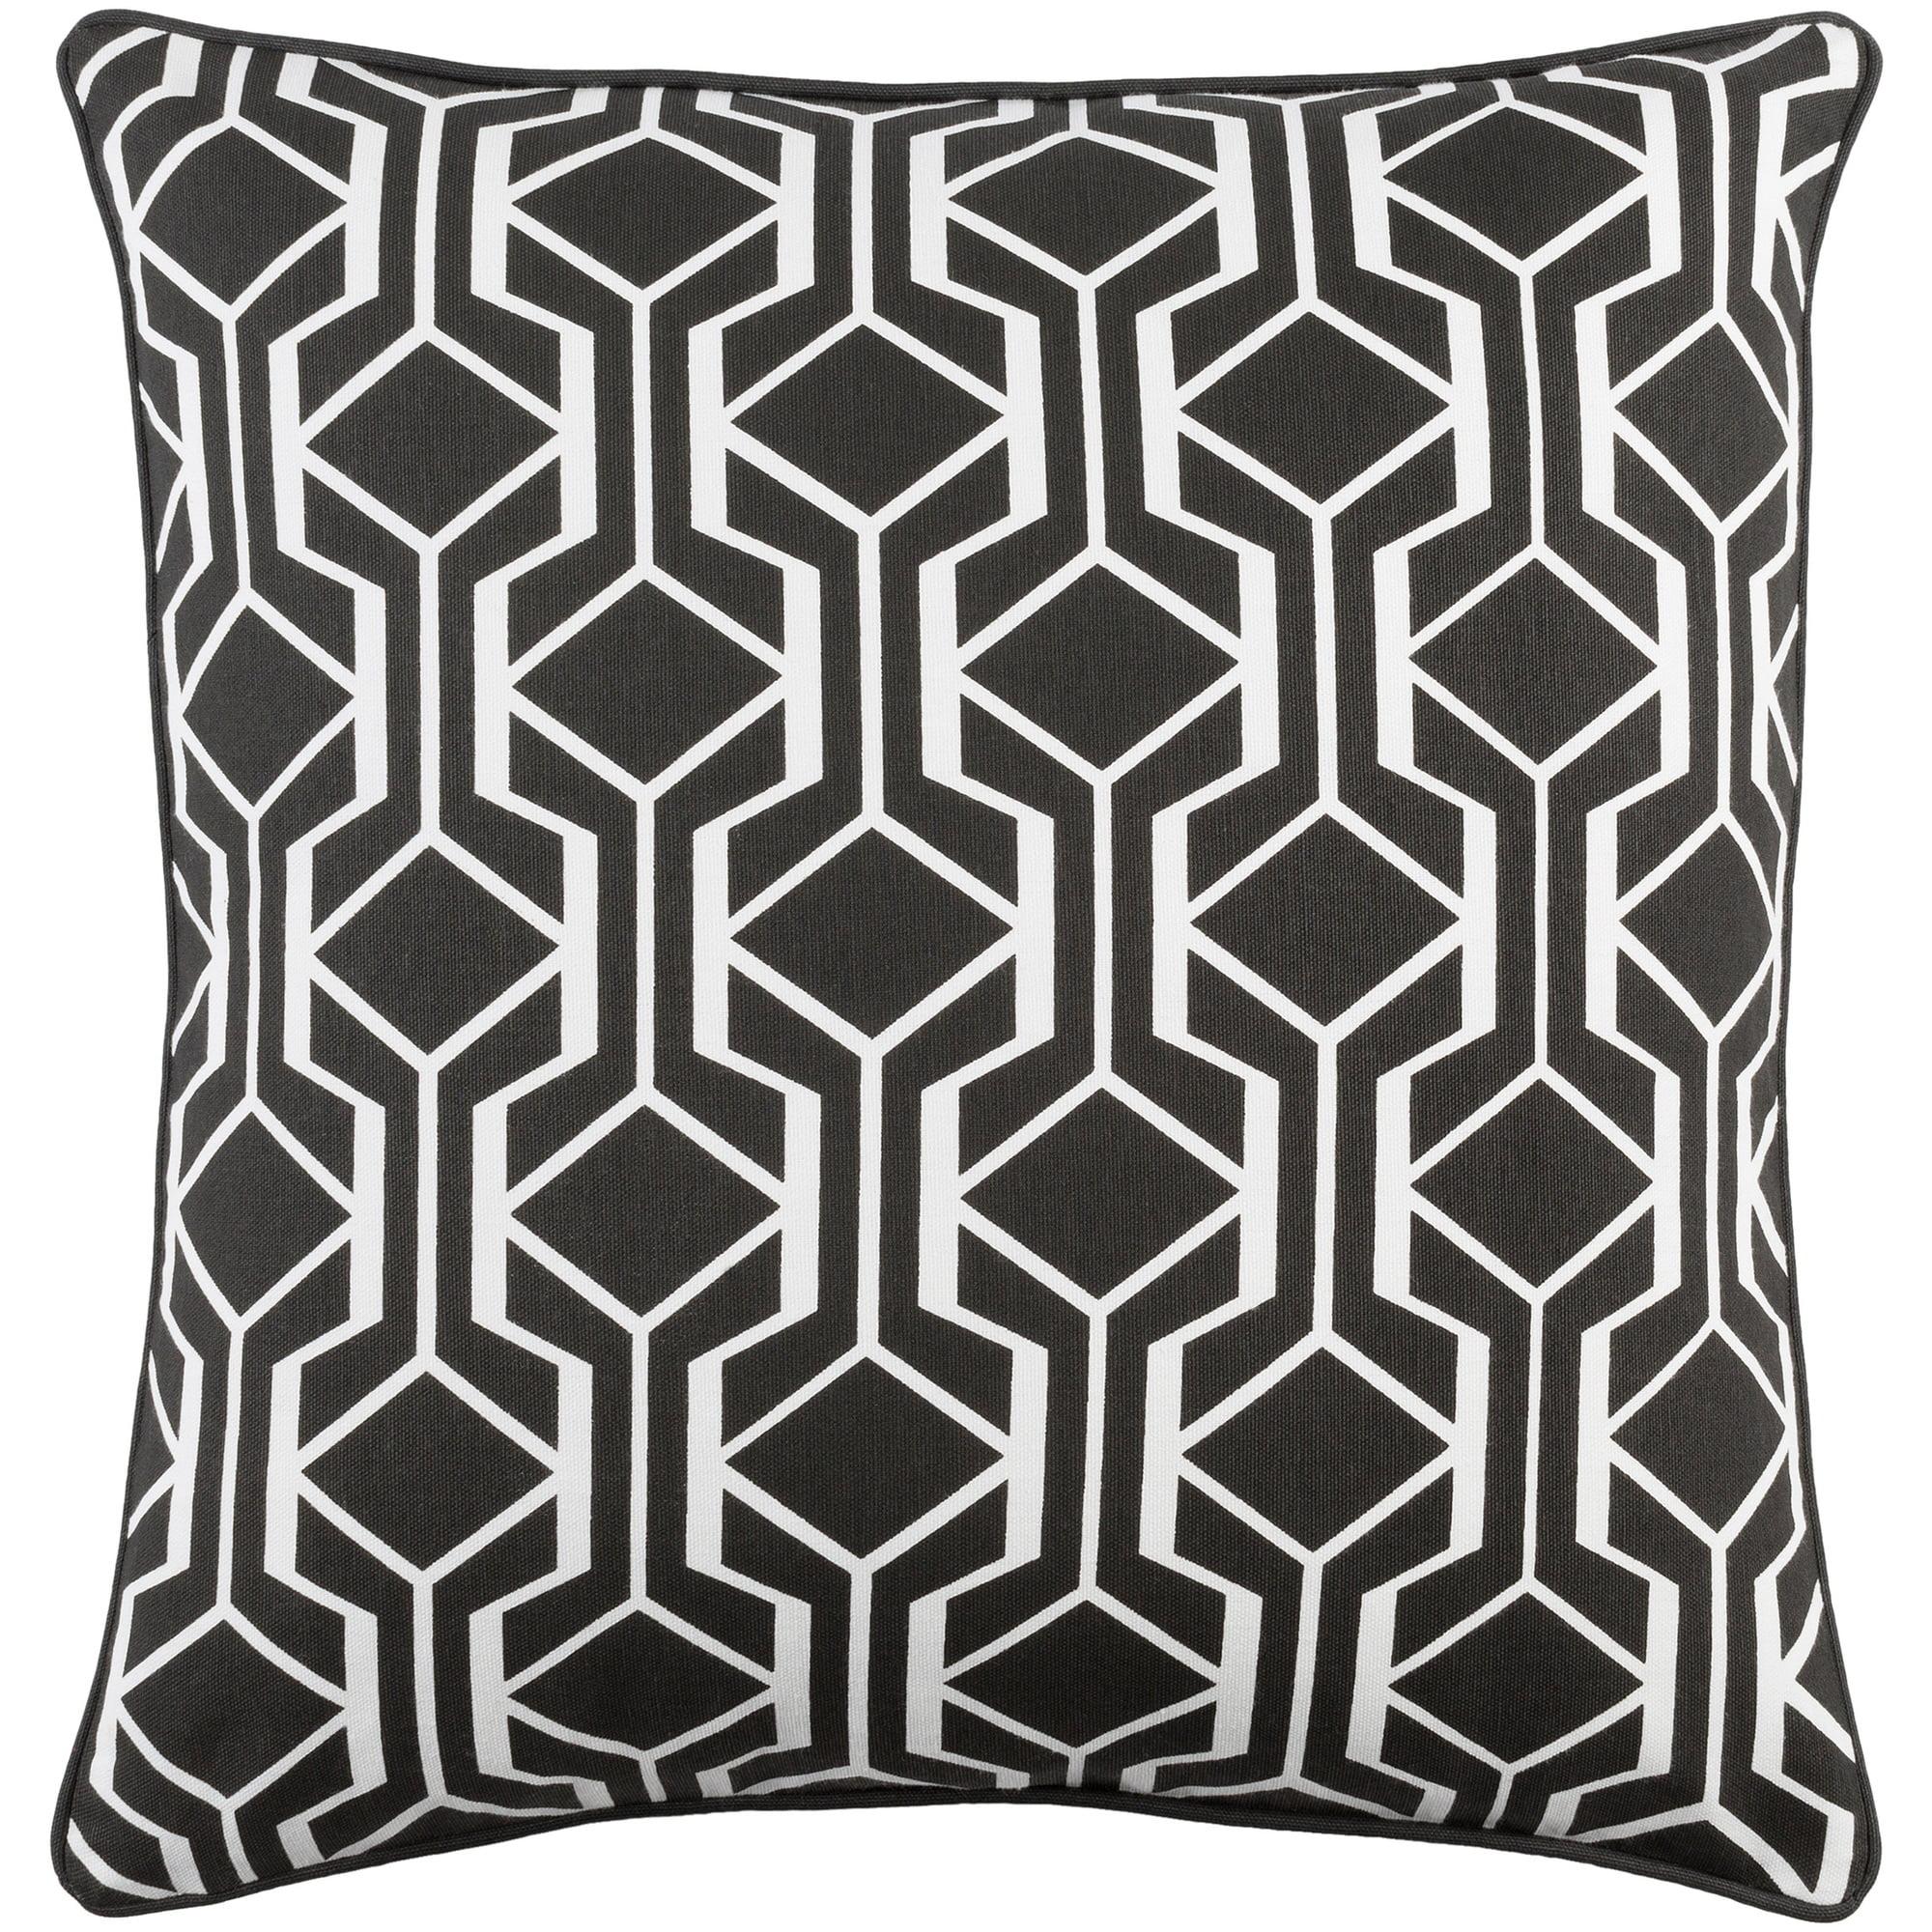 "Artistic Weavers Inga Greta 18"" x 18"" Pillow (with Down Fill)"